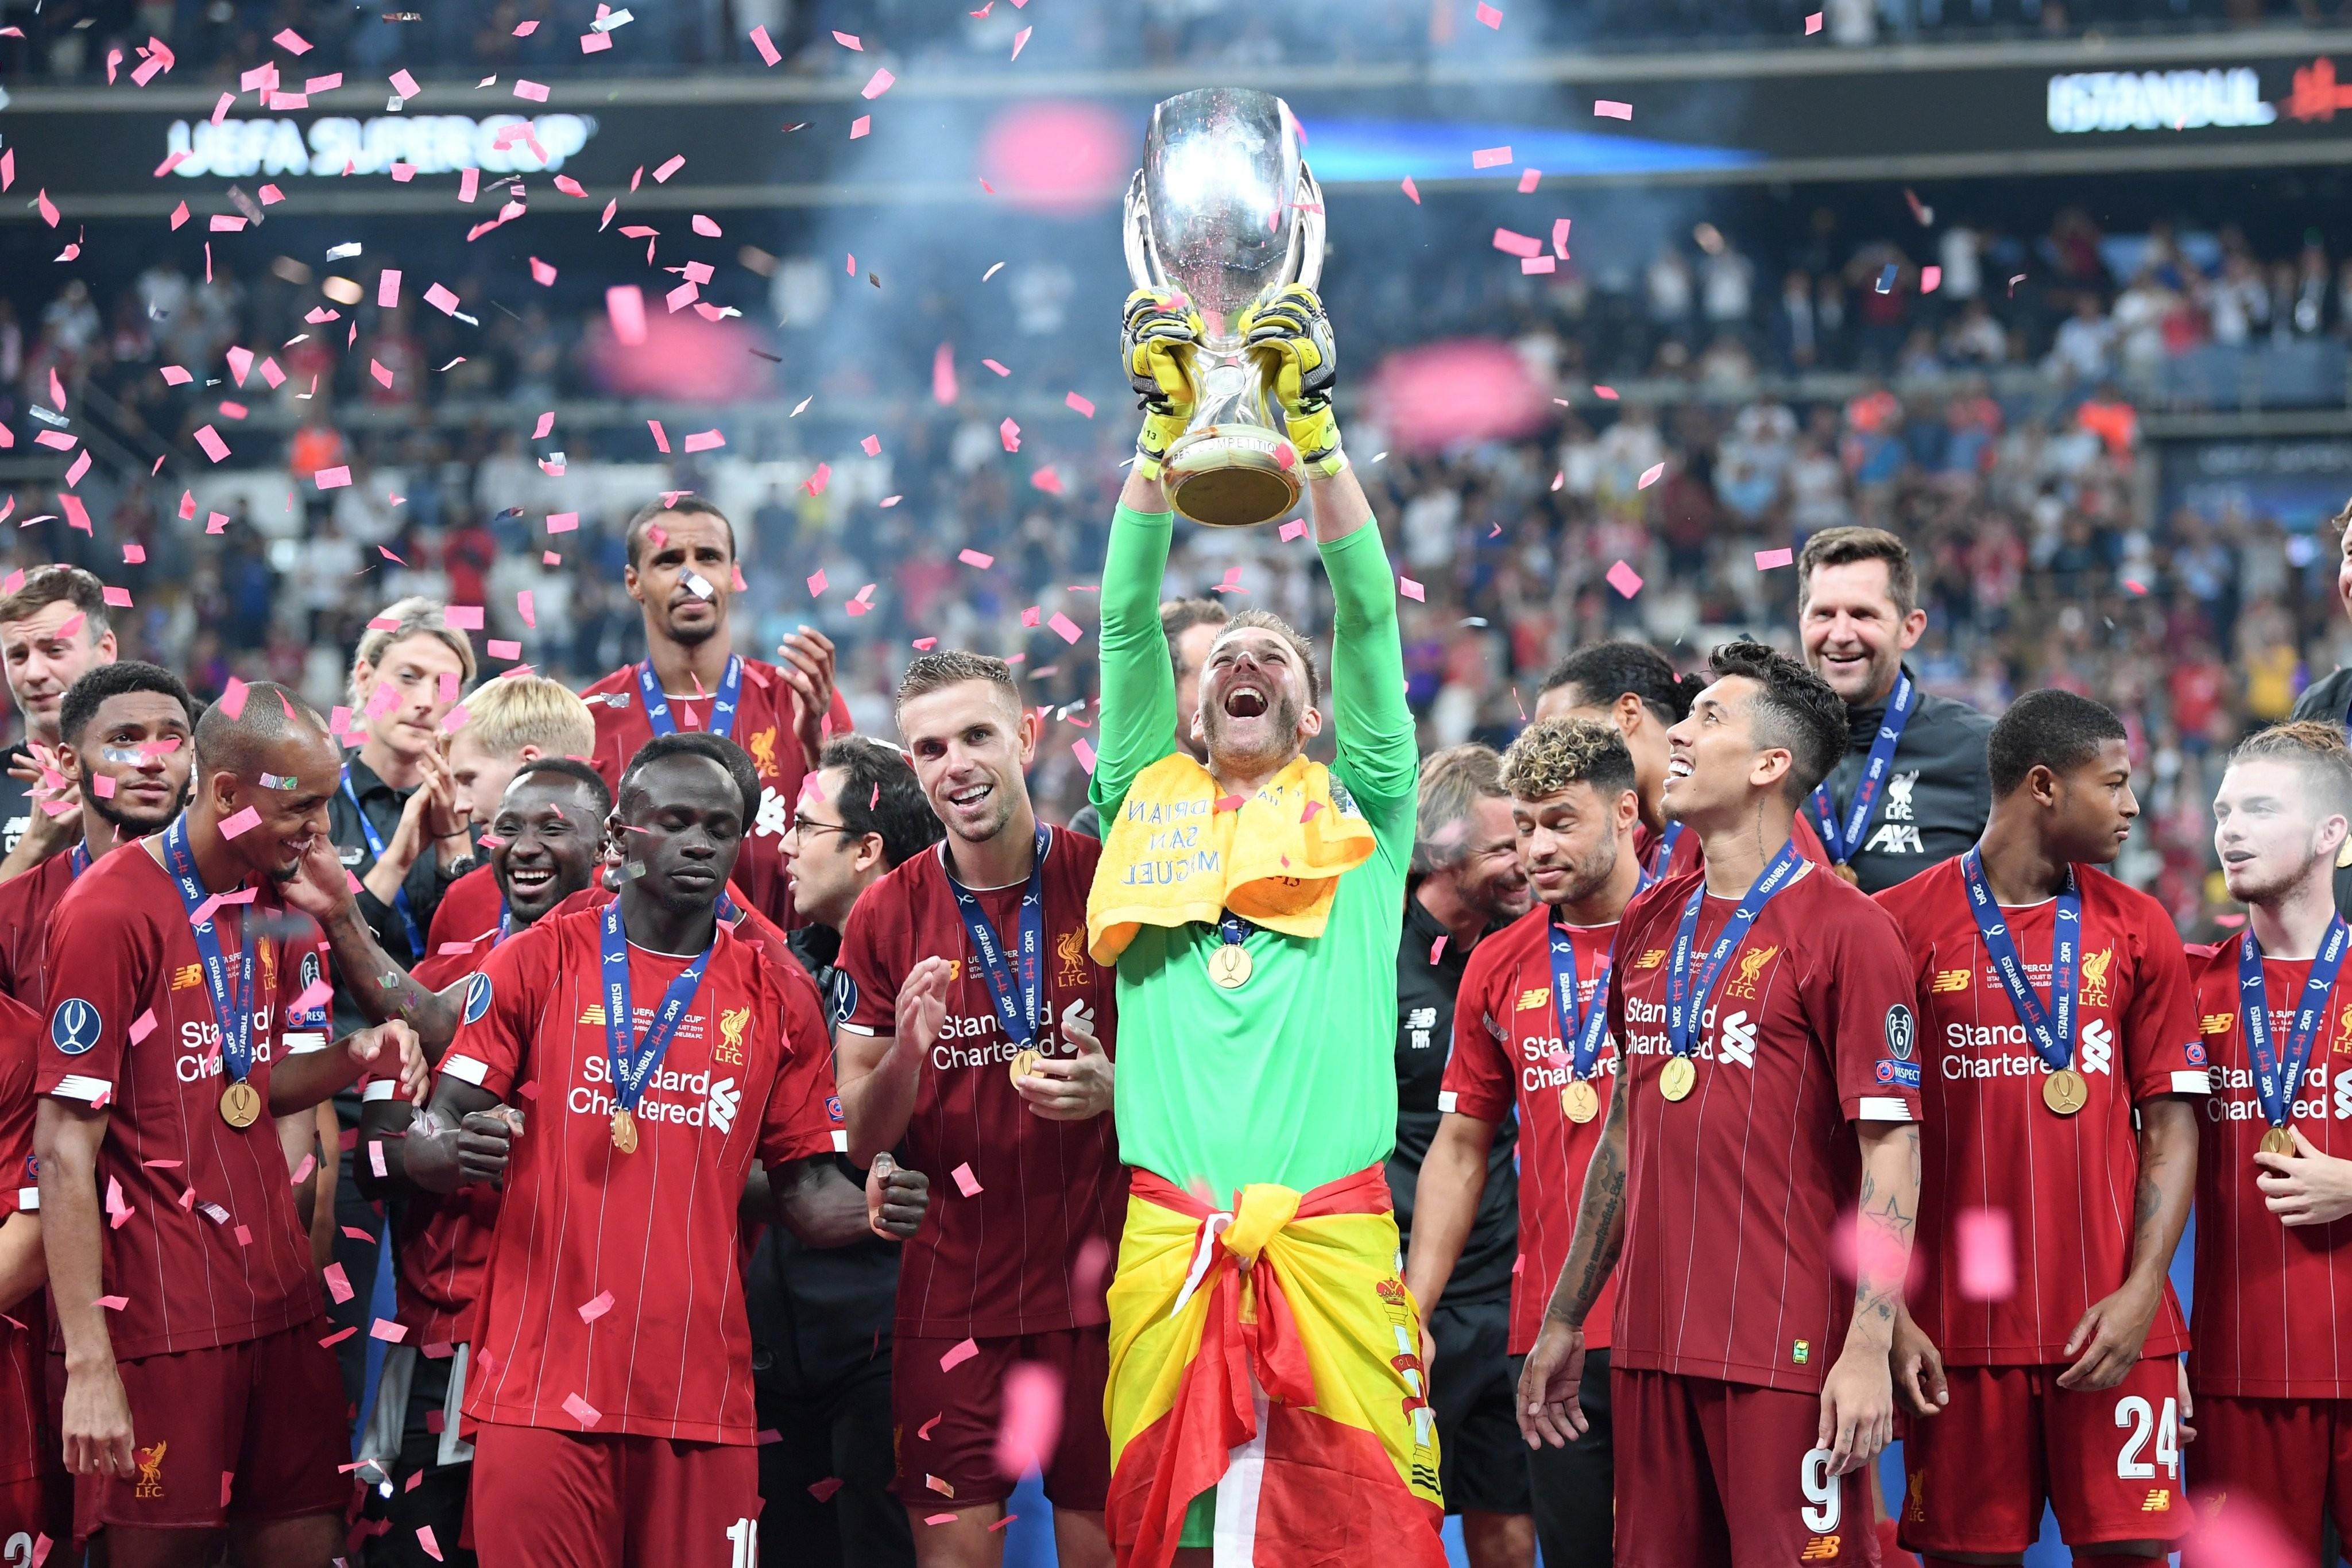 "<p>Фото © twitter/<a href=""https://twitter.com/ChampionsLeague/status/1161760759707316226?s=20"" target=""_self"">ChampionsLeague</a></p>"